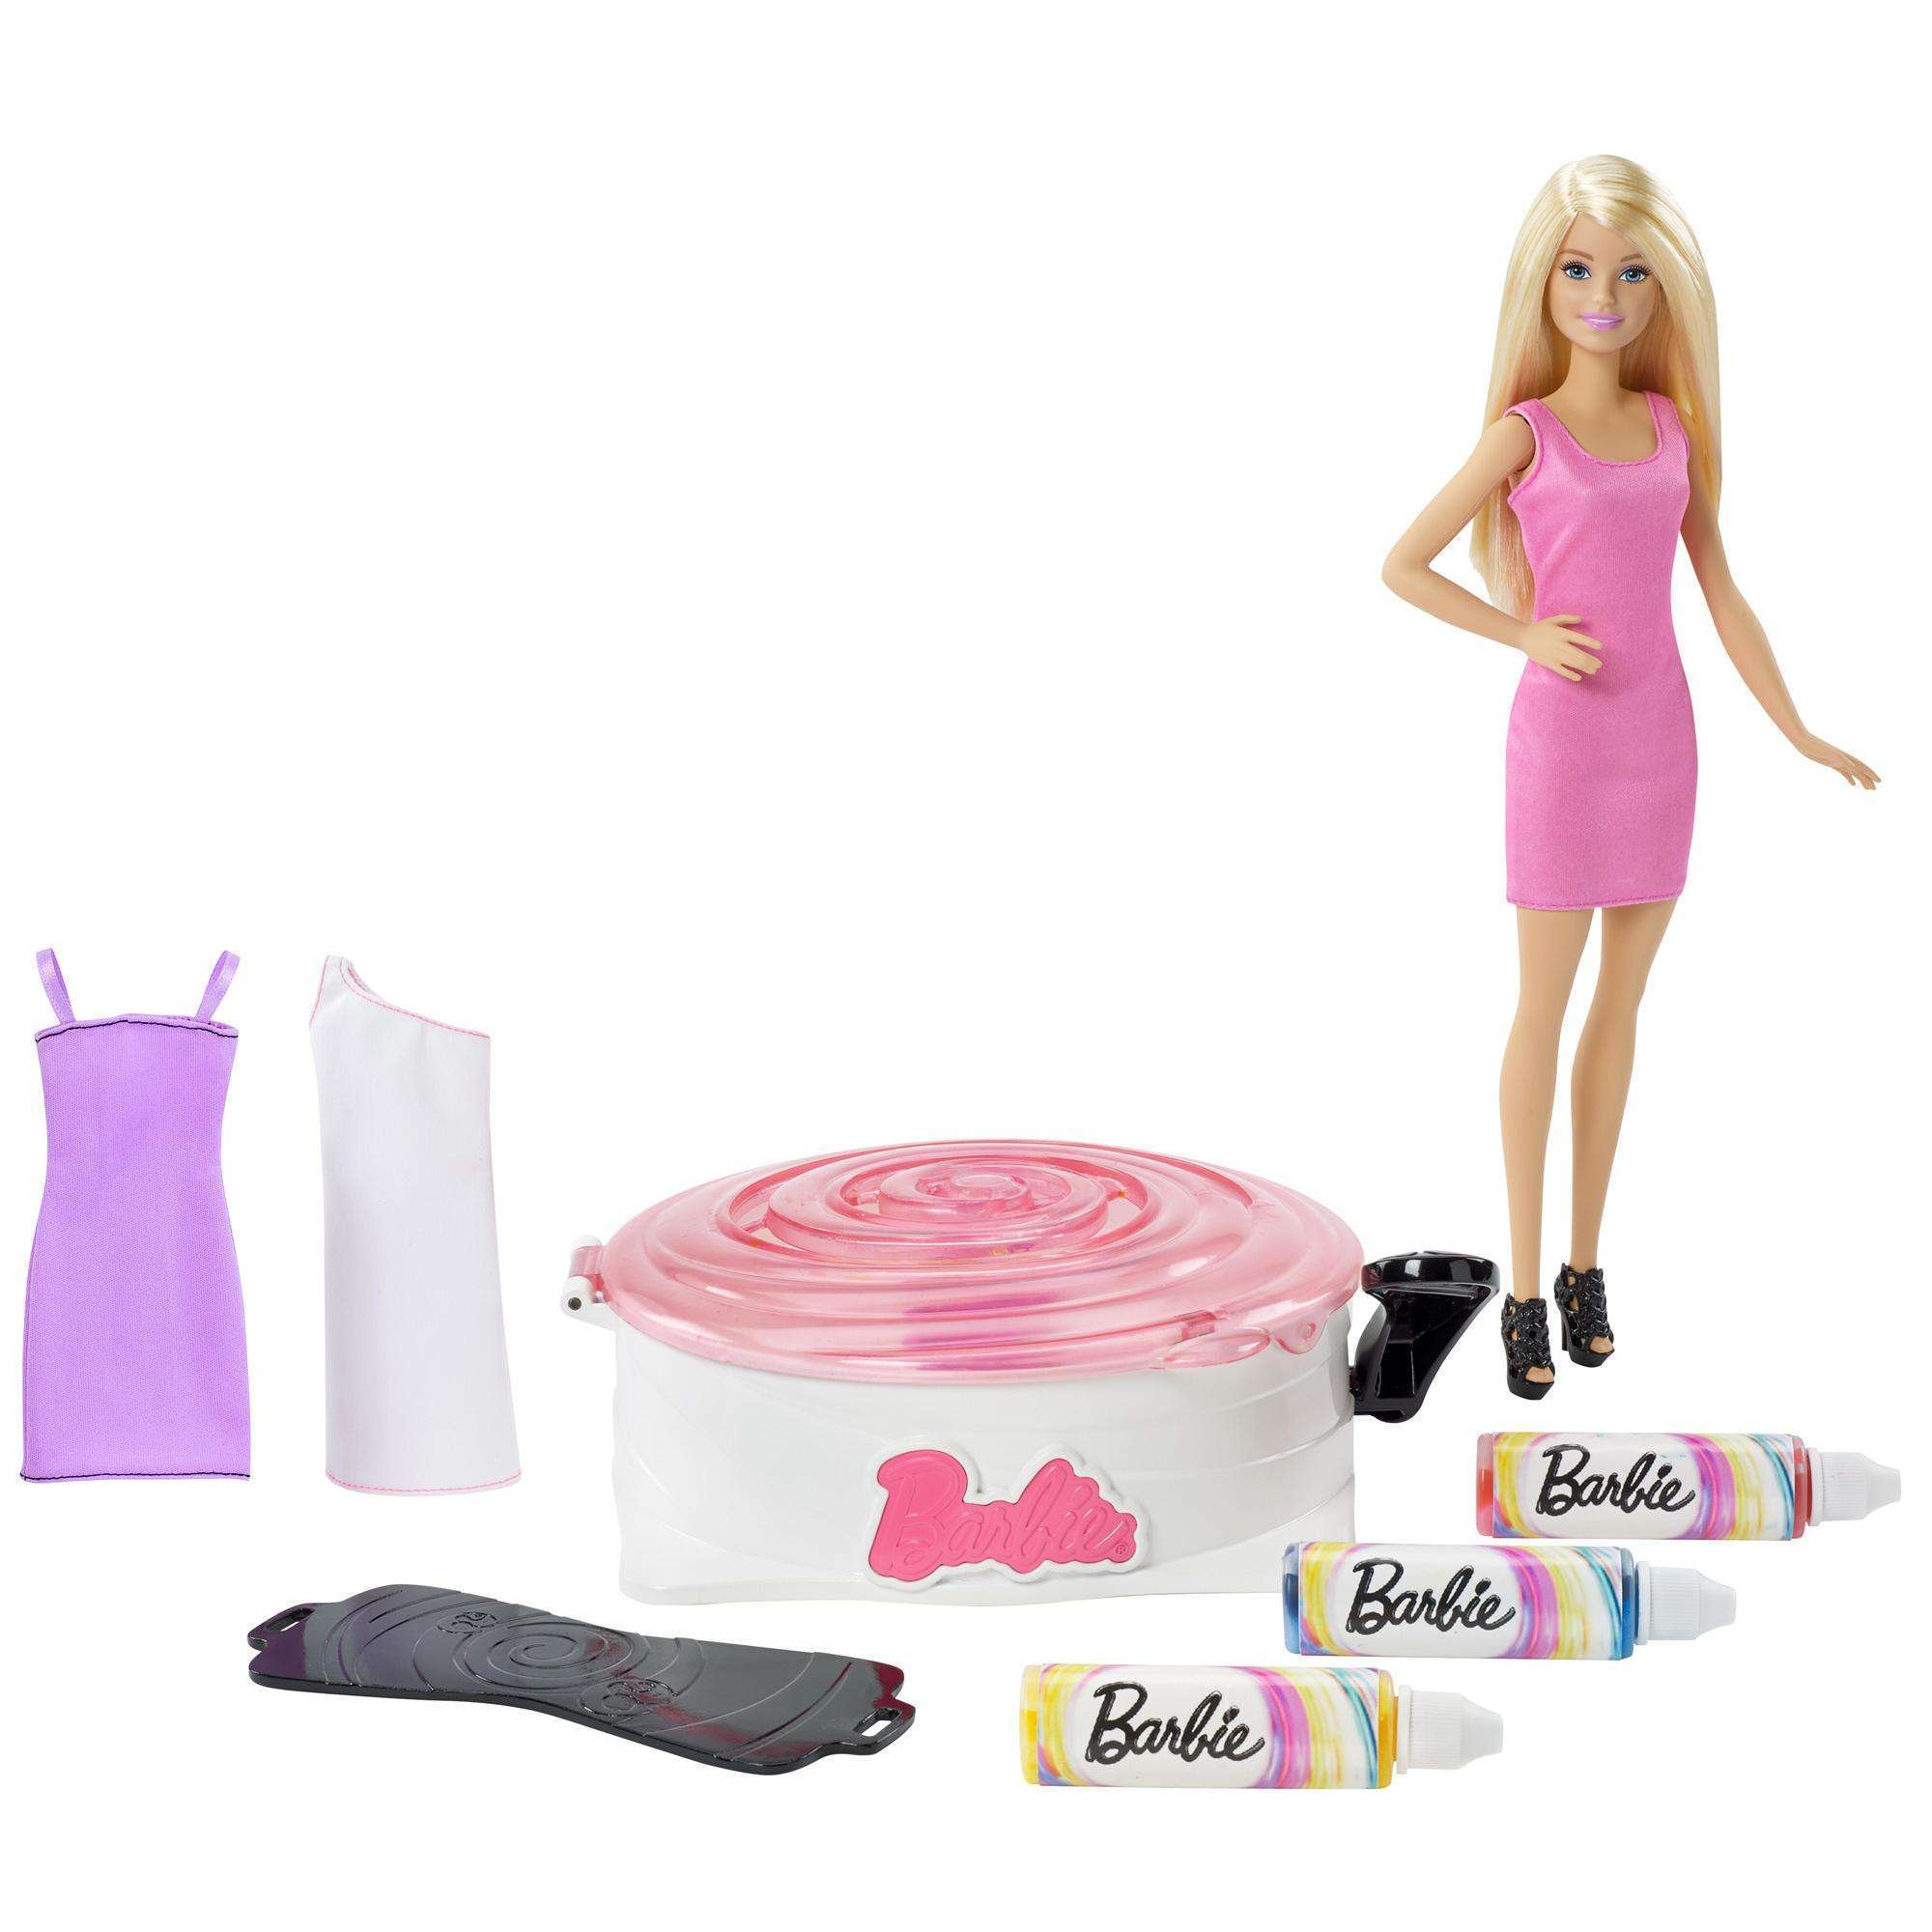 Barbie Spin Art Designer with Barbie Doll